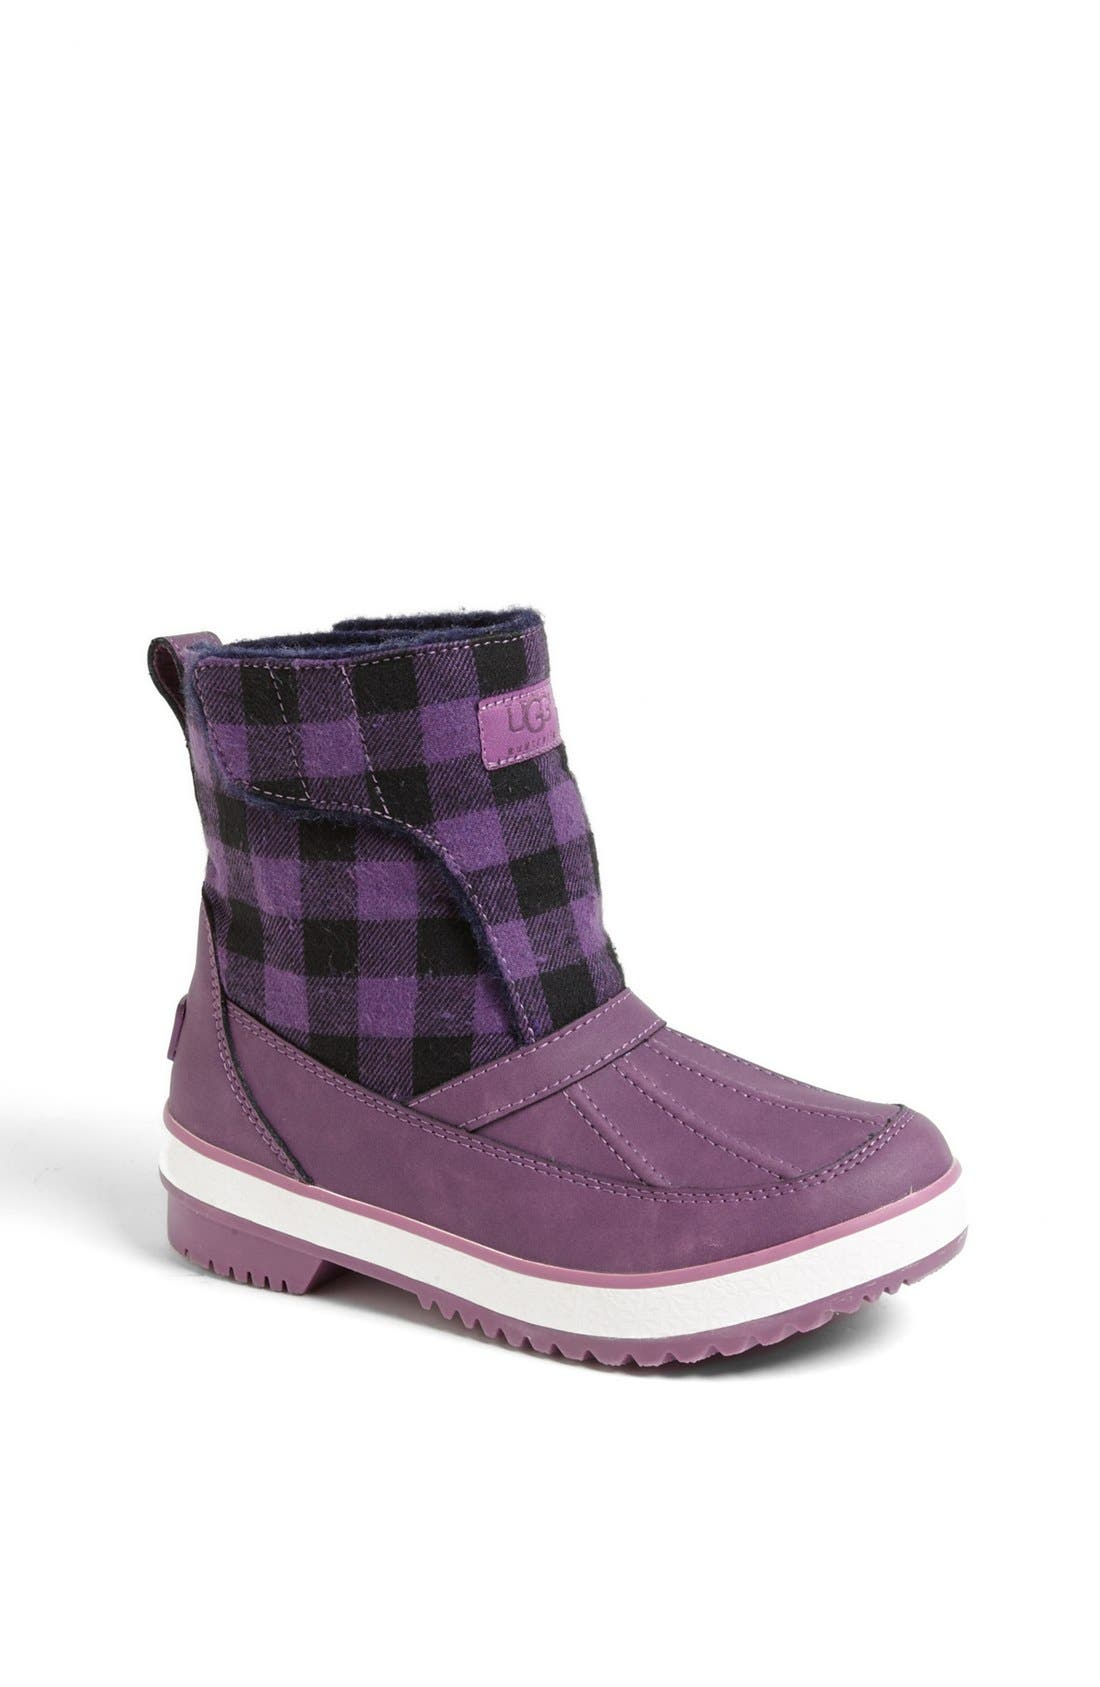 Main Image - UGG® Australia 'Astin' Waterproof Boot (Little Kid & Big Kid)